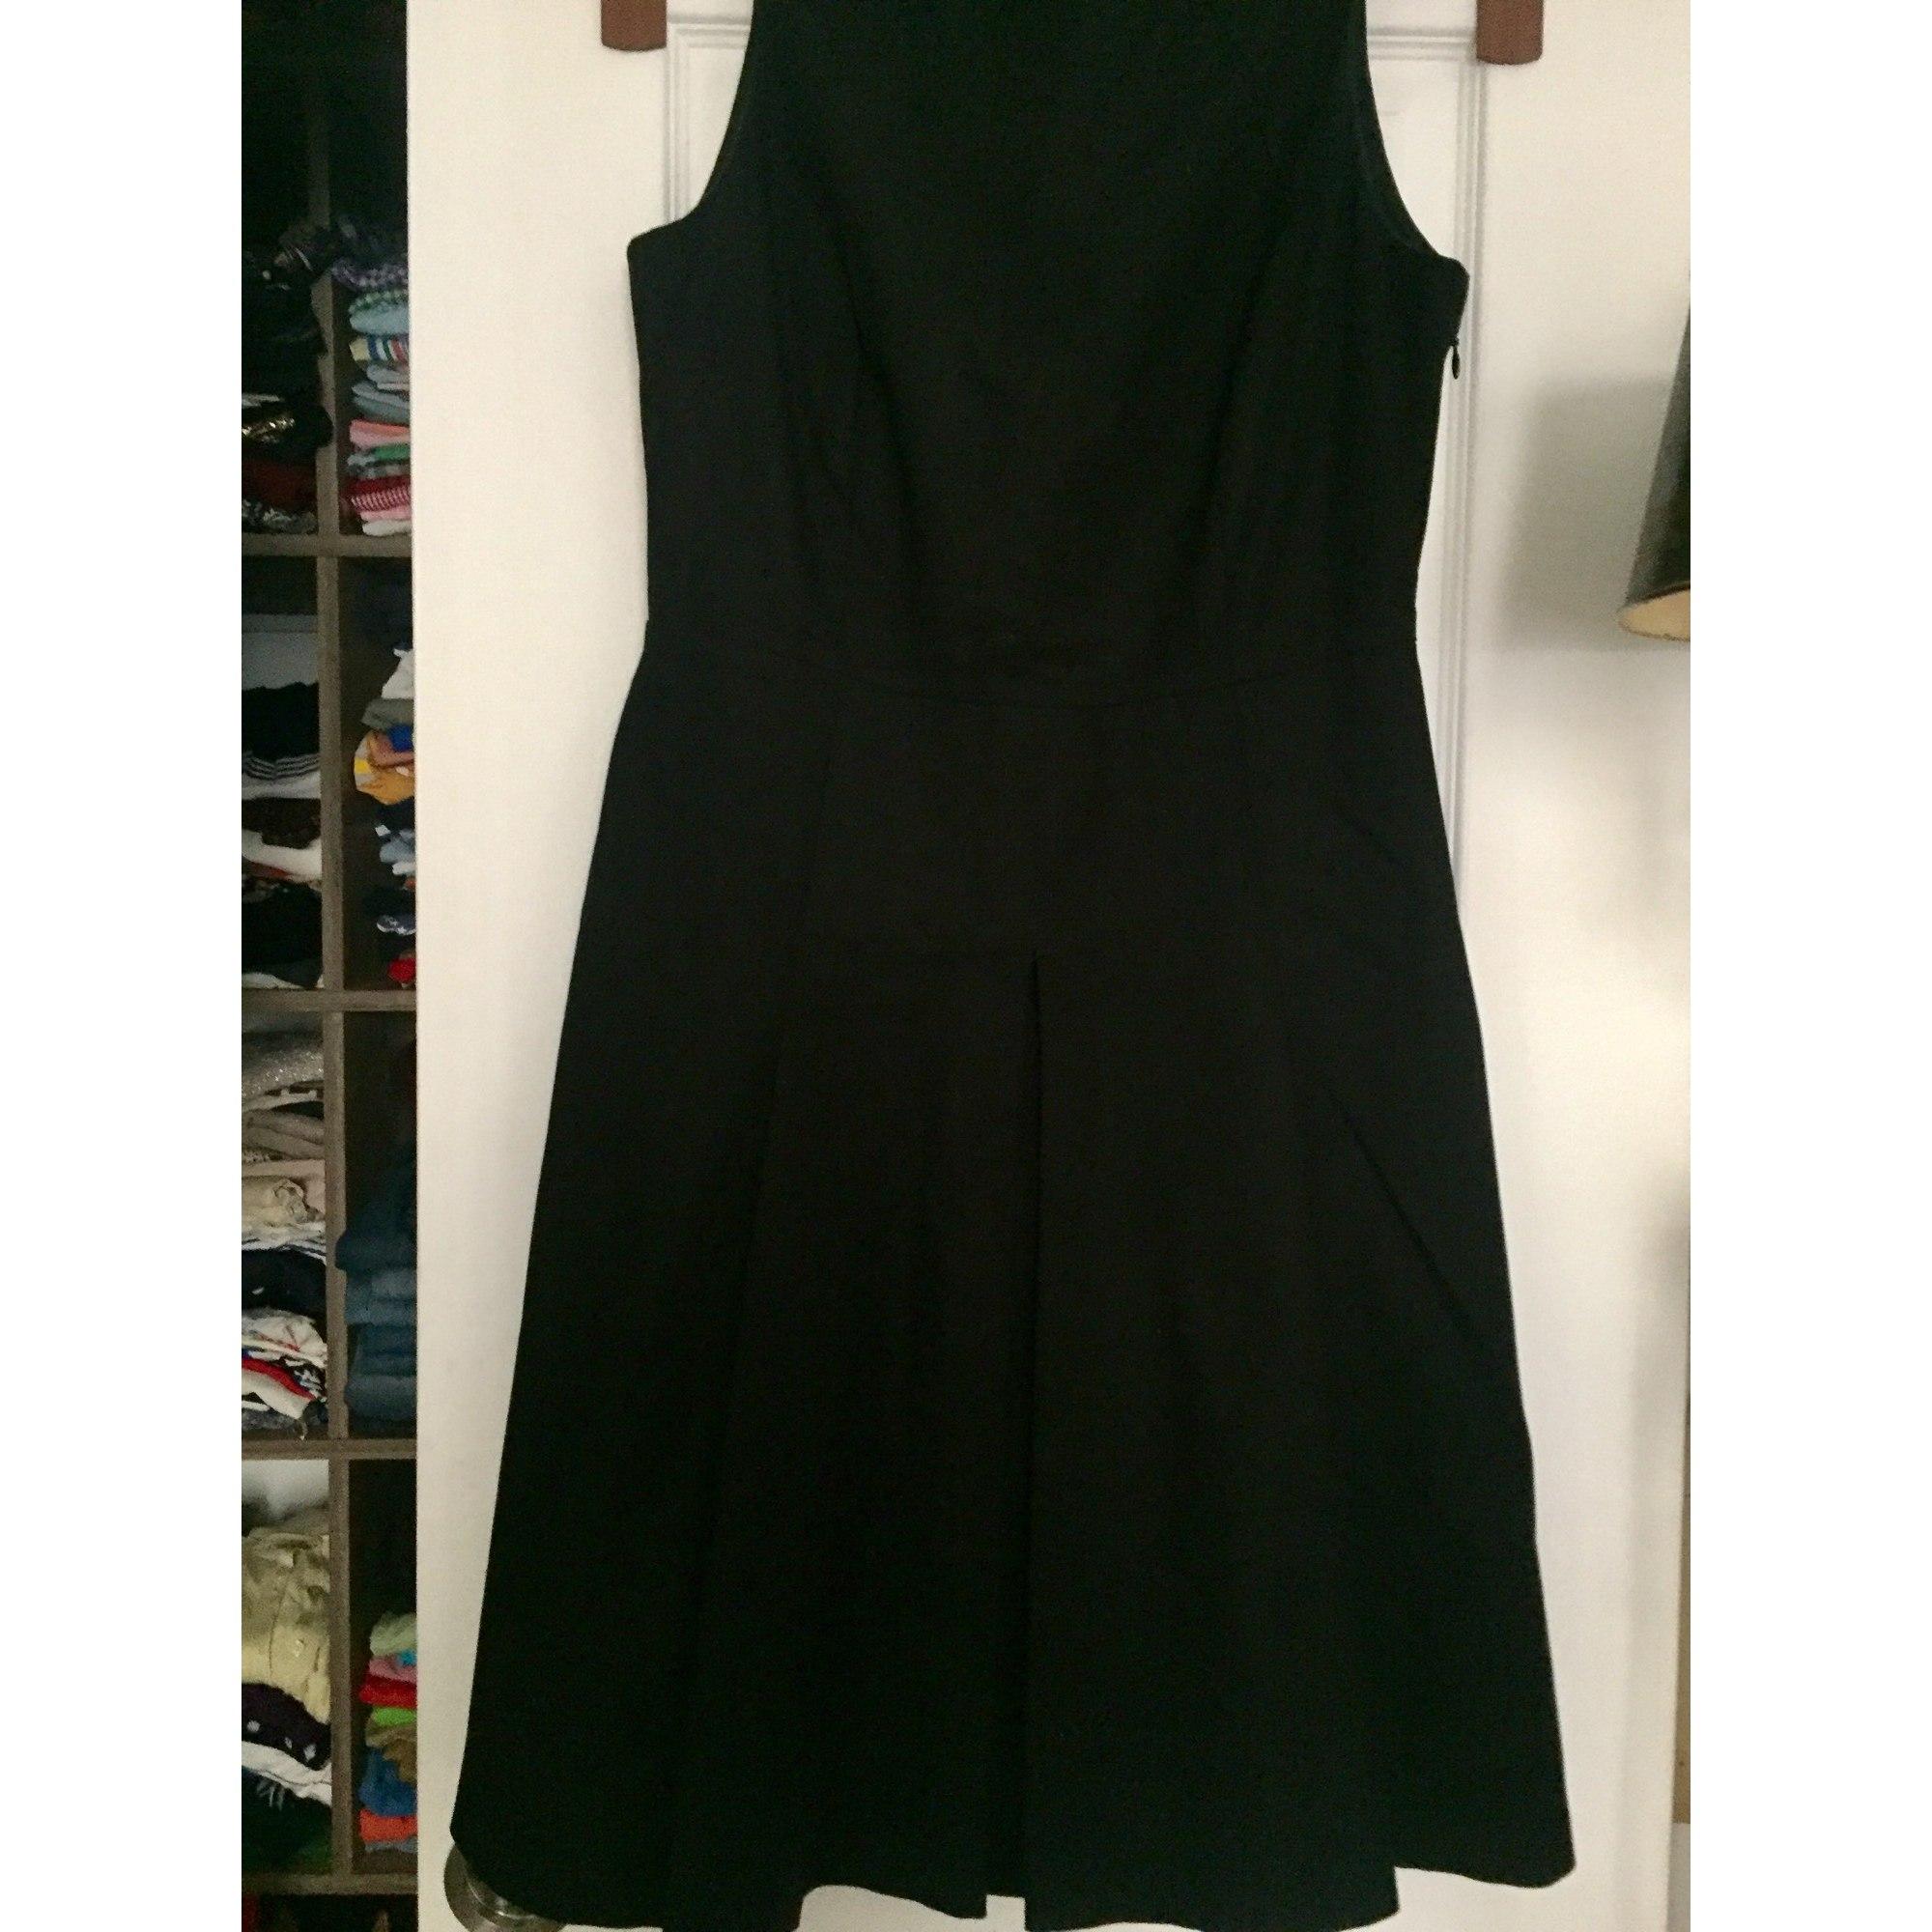 e8d3d35e3db Robe courte CAROLL 40 (L